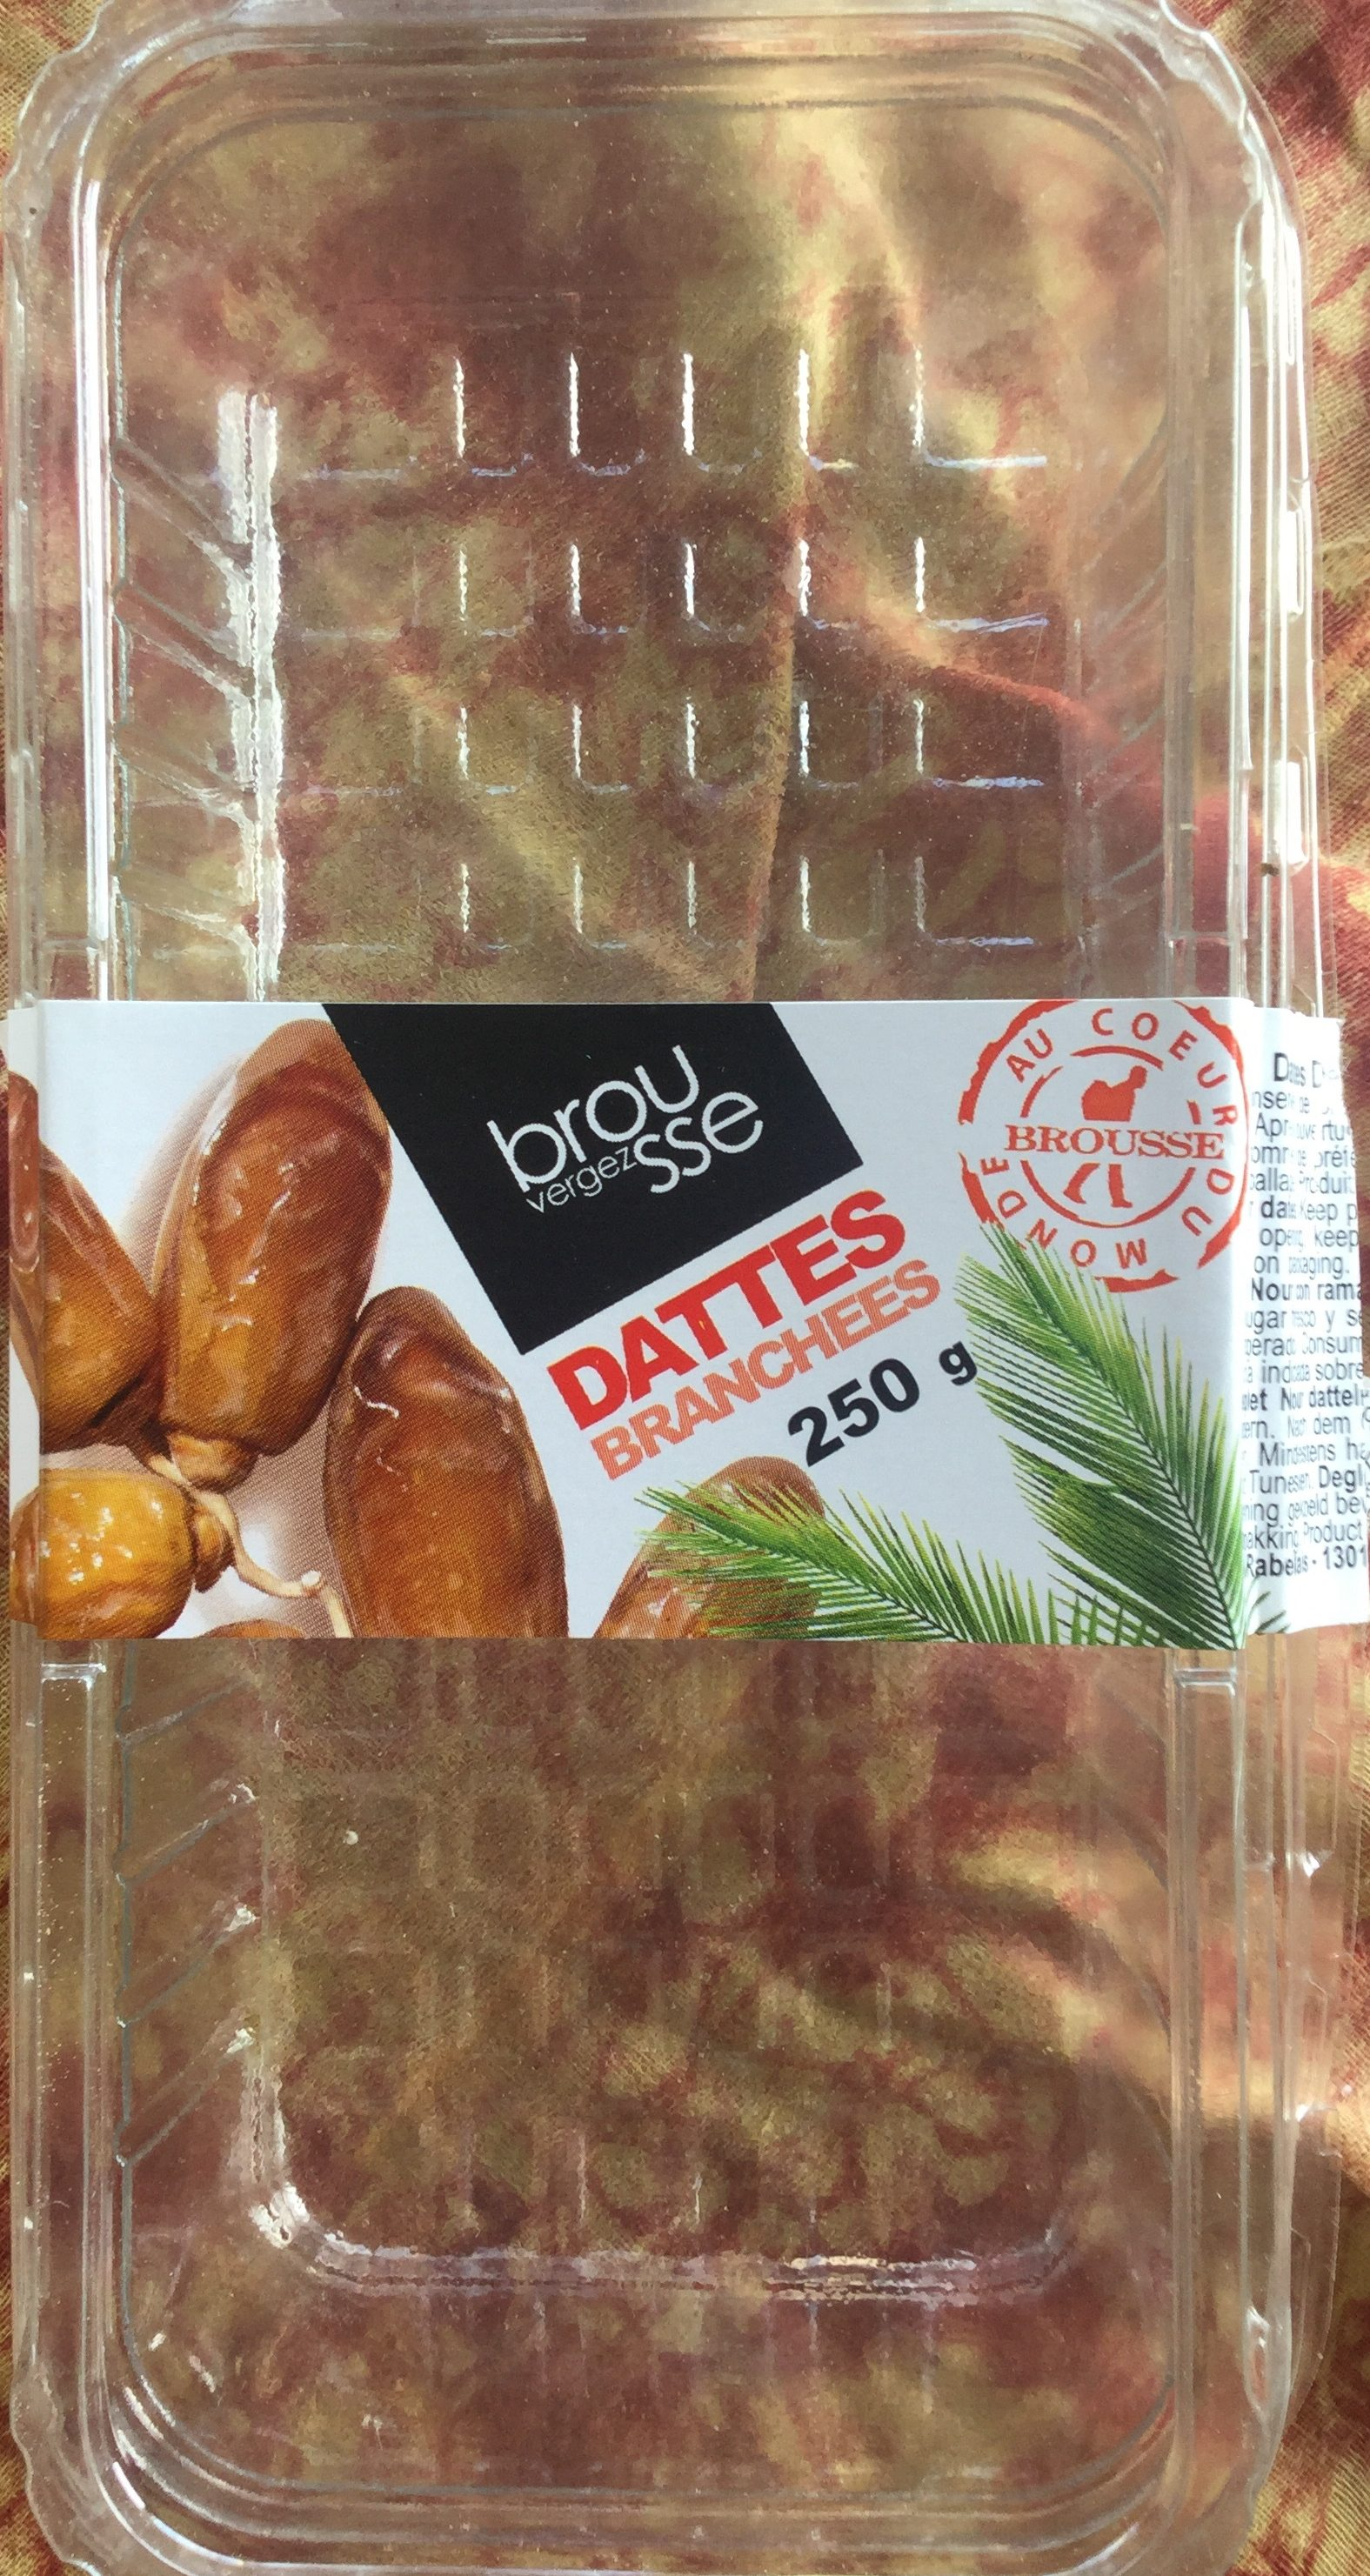 Dattes branchées - Prodotto - fr